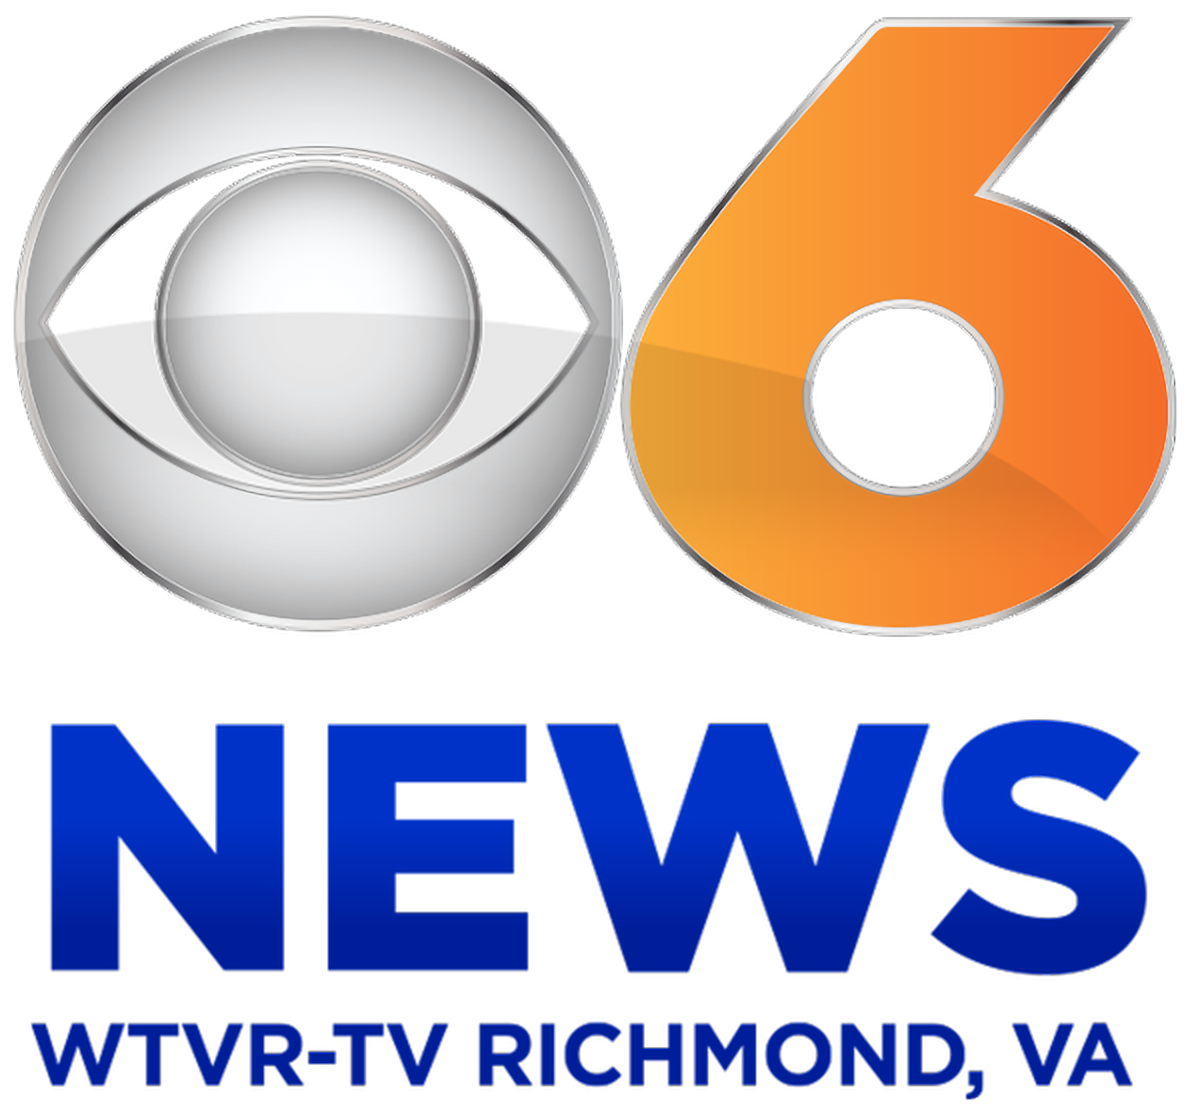 WTVR 6 news logo